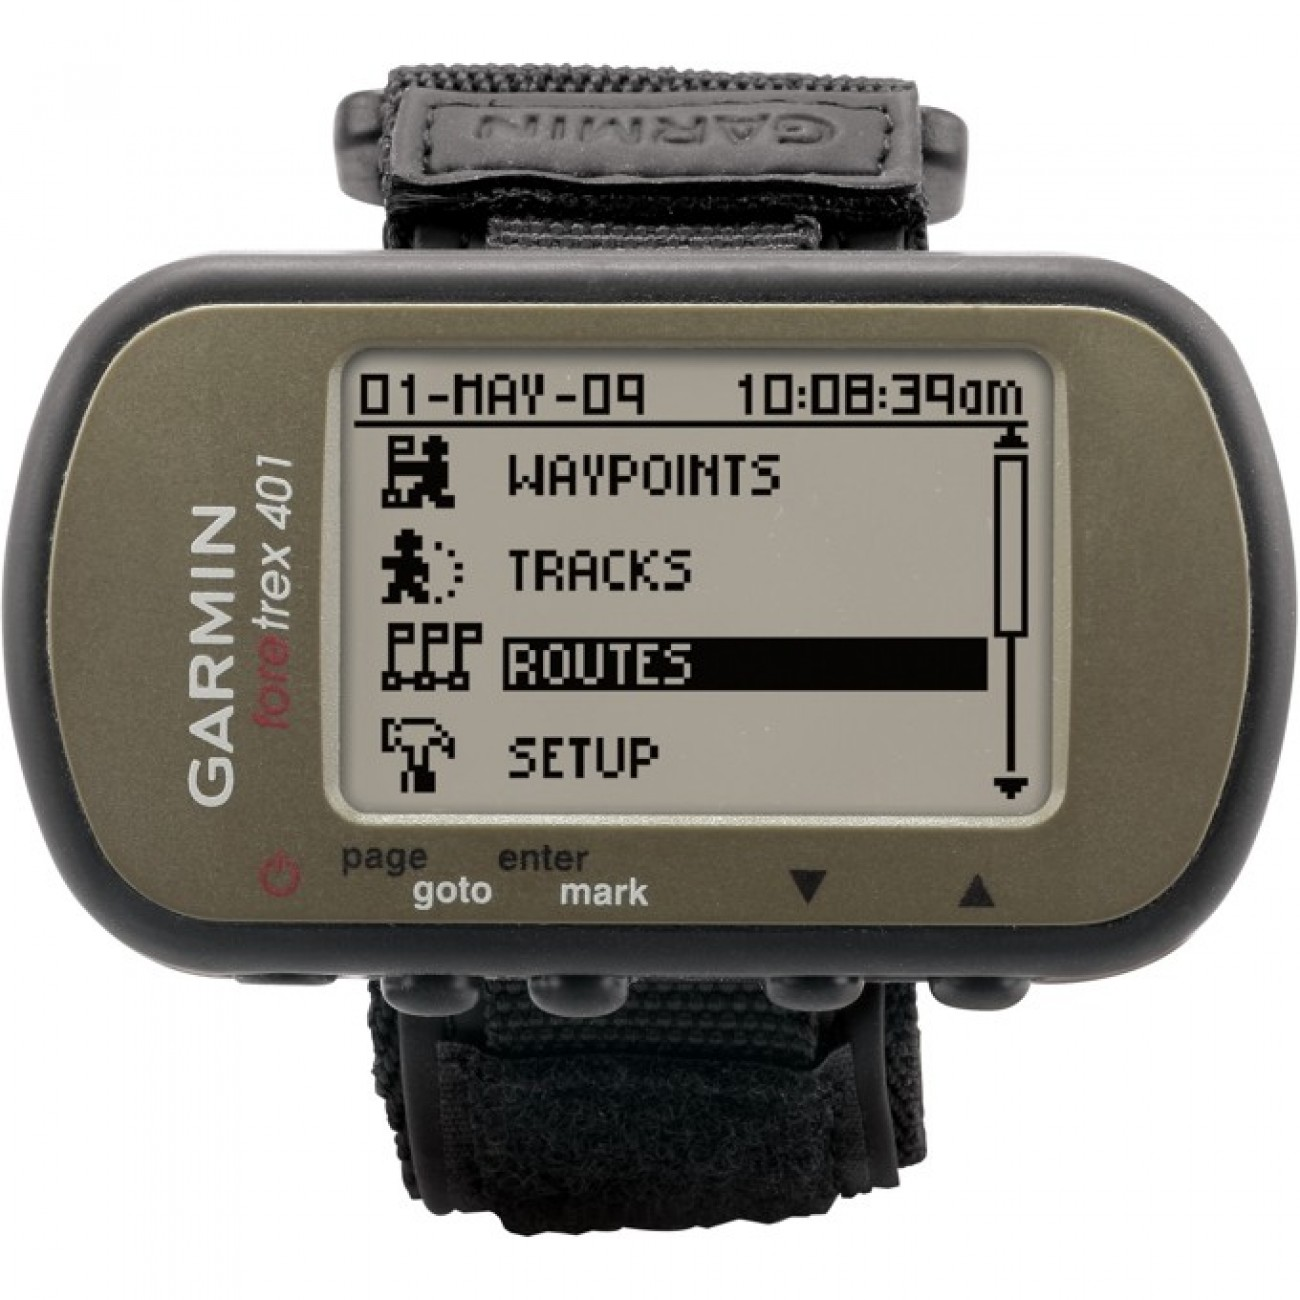 GARMIN Foretrex 401, водоустойчив в GPS Навигатори -  | Alleop